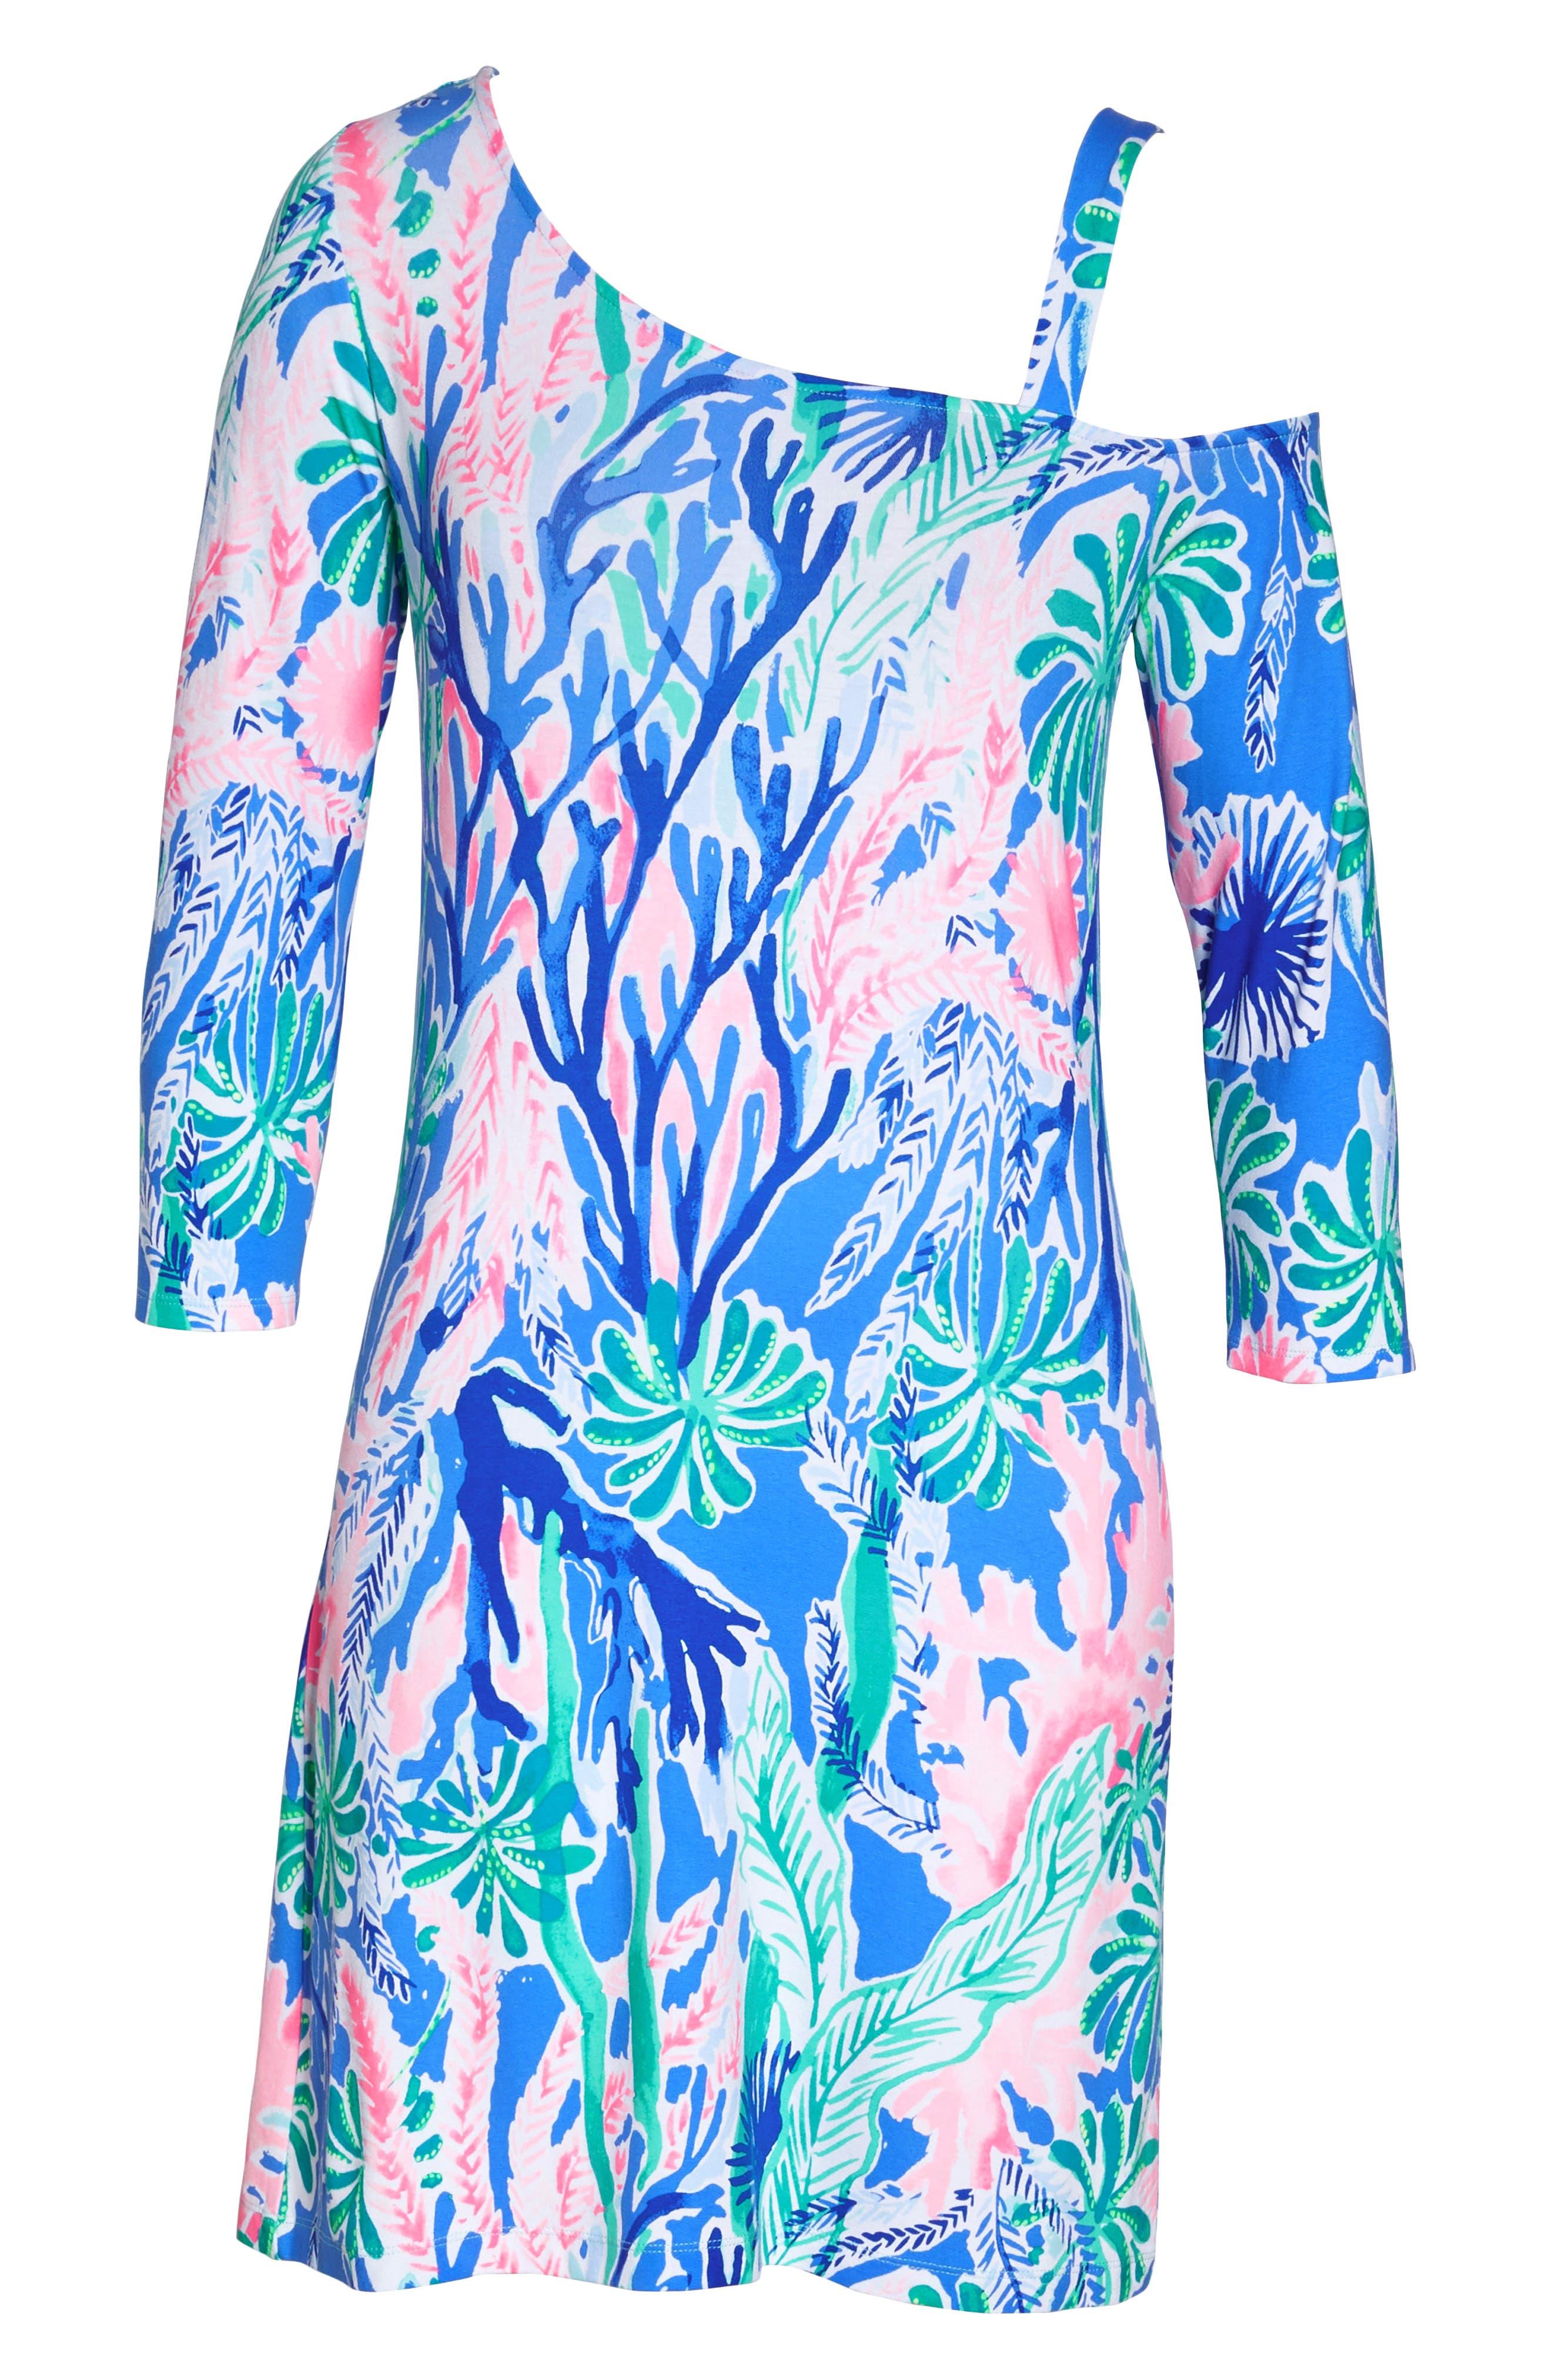 One-Shoulder Minidress,                             Alternate thumbnail 8, color,                             400